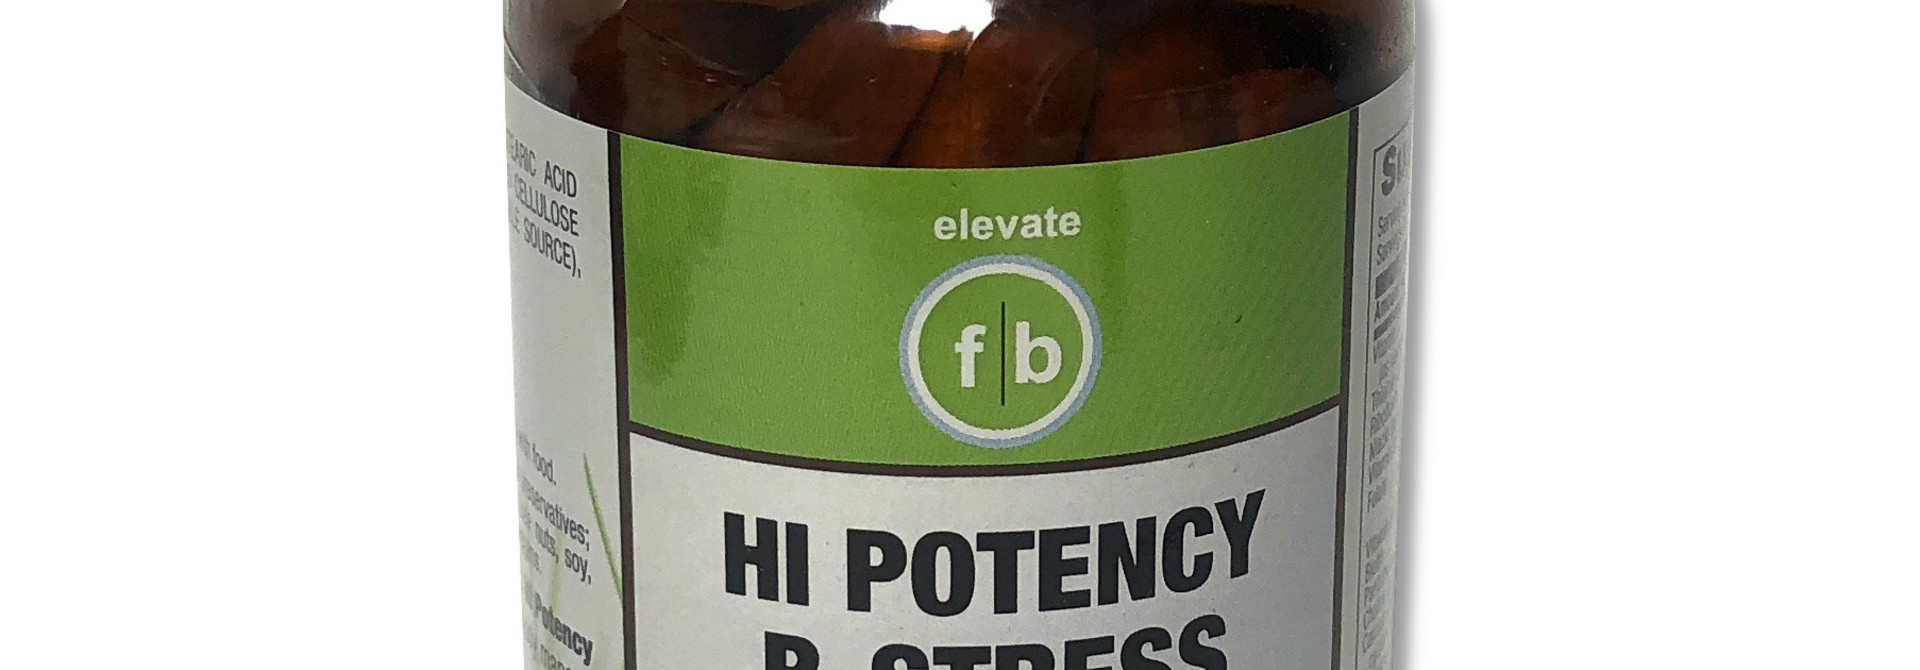 High Potency B-Stress